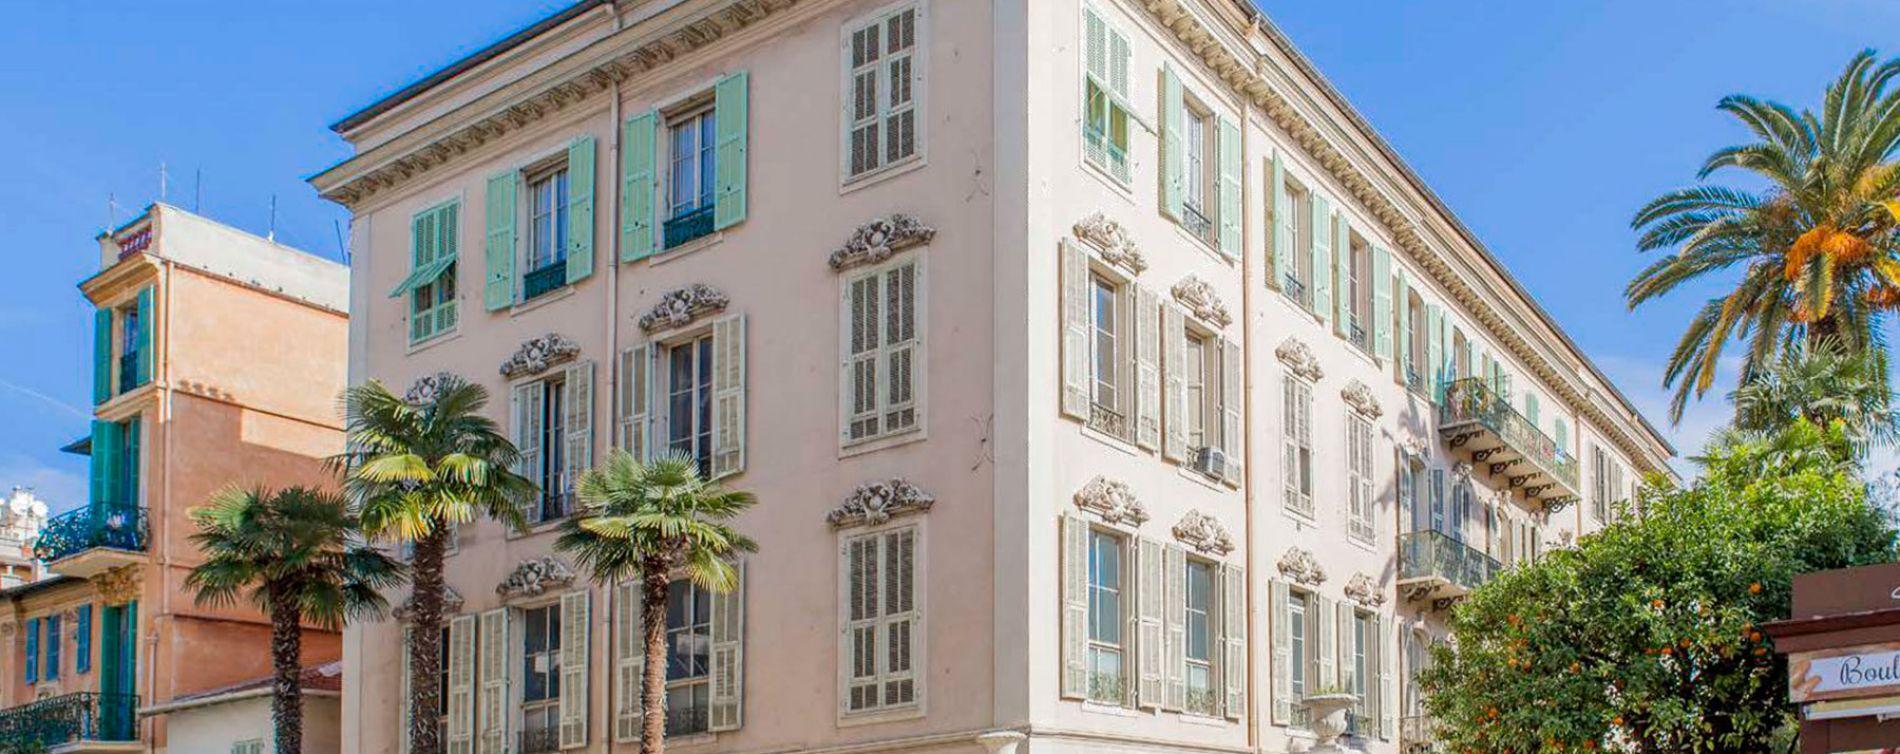 Résidence Villa Taffe à Nice